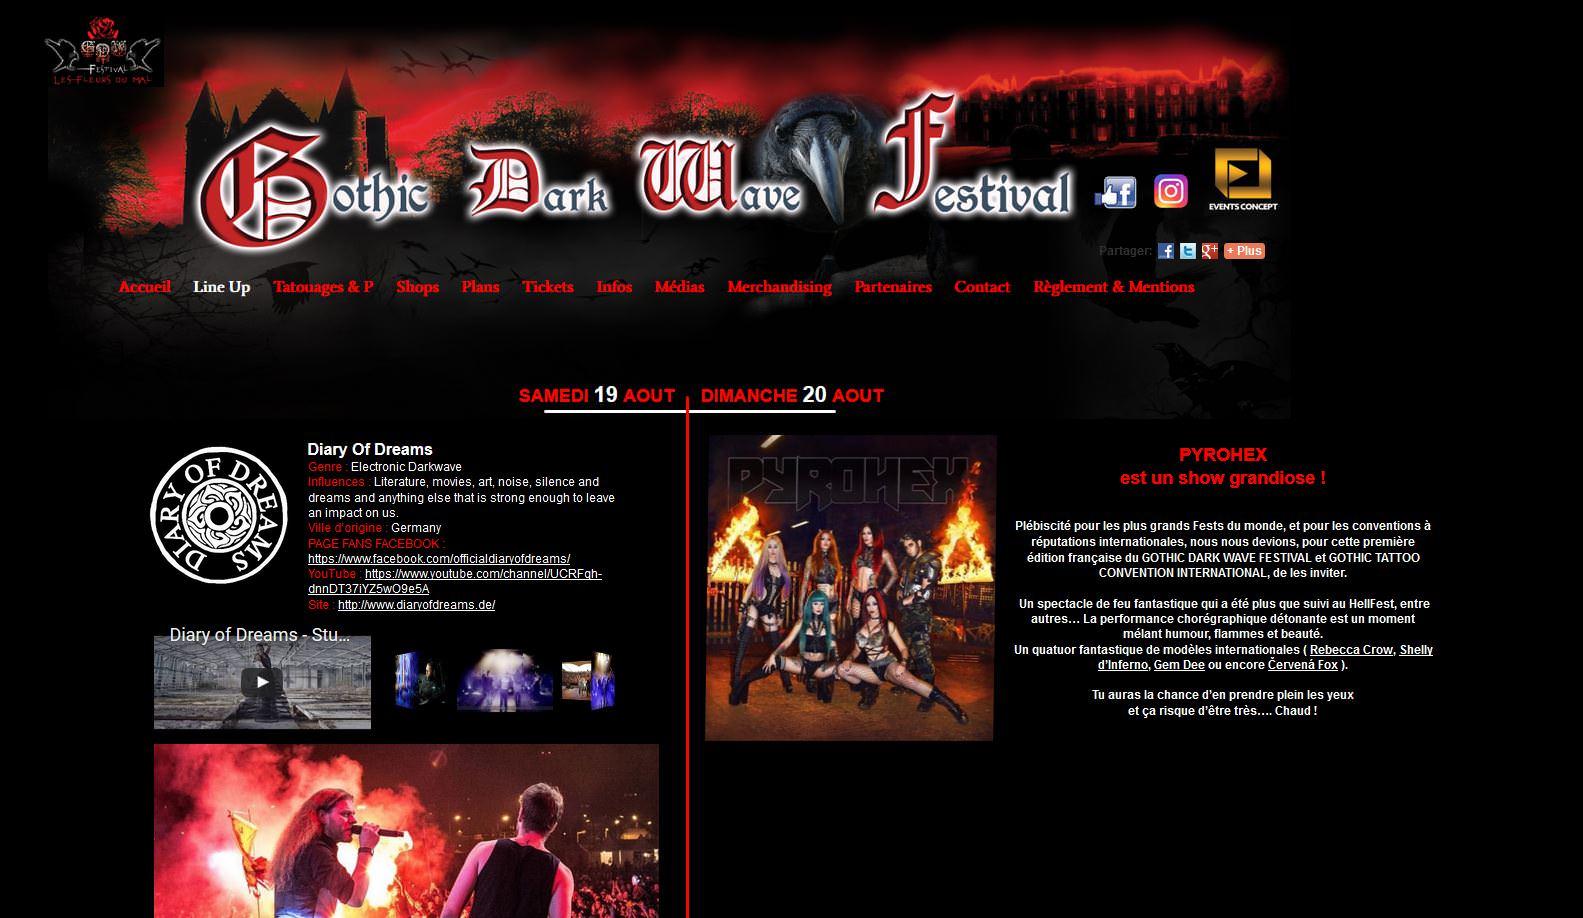 Pyrohex arnaque GDW Festival